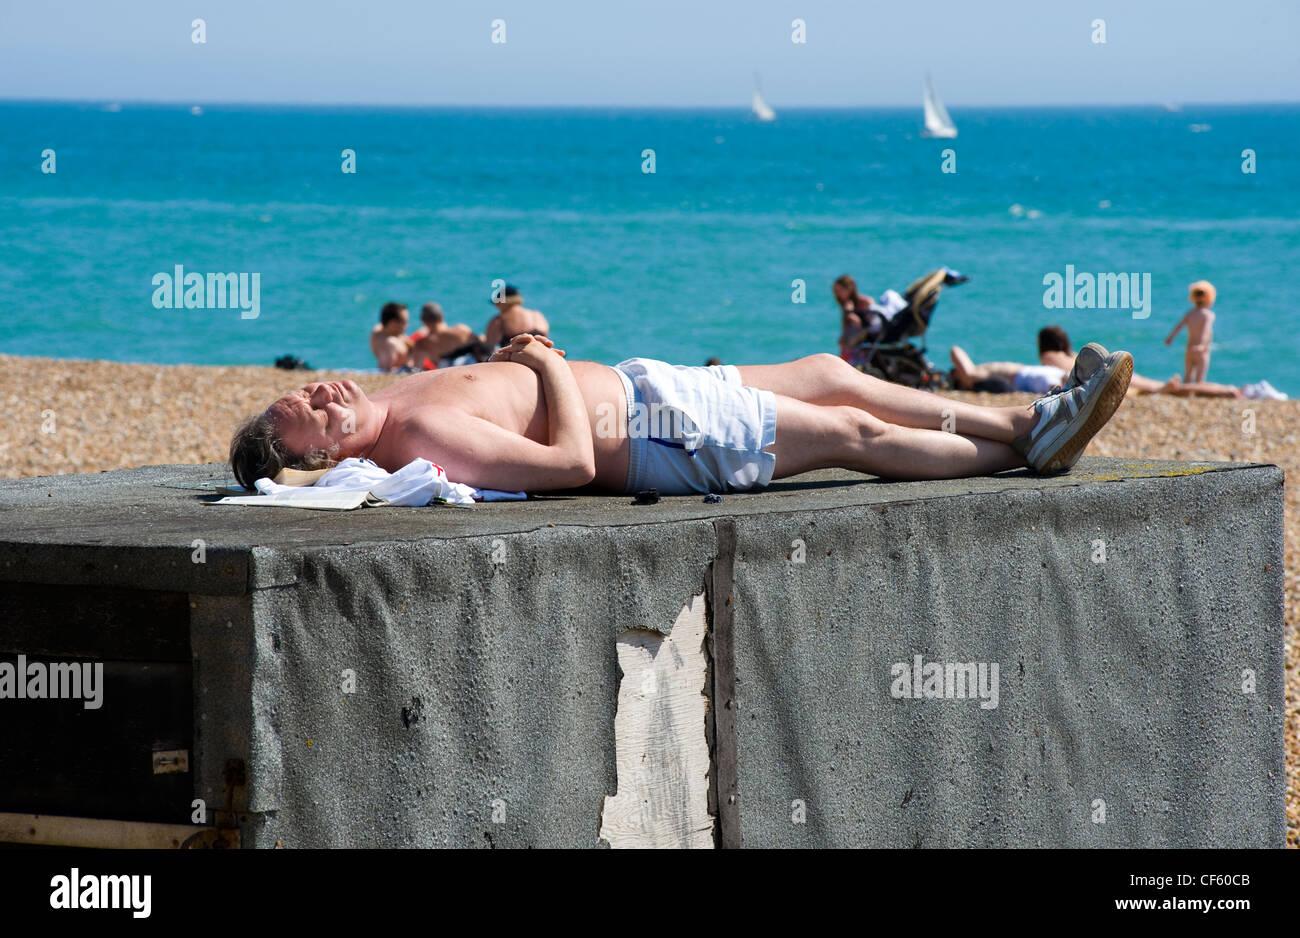 A man sunbathing on top of a deckchair hut on Brighton beach. - Stock Image